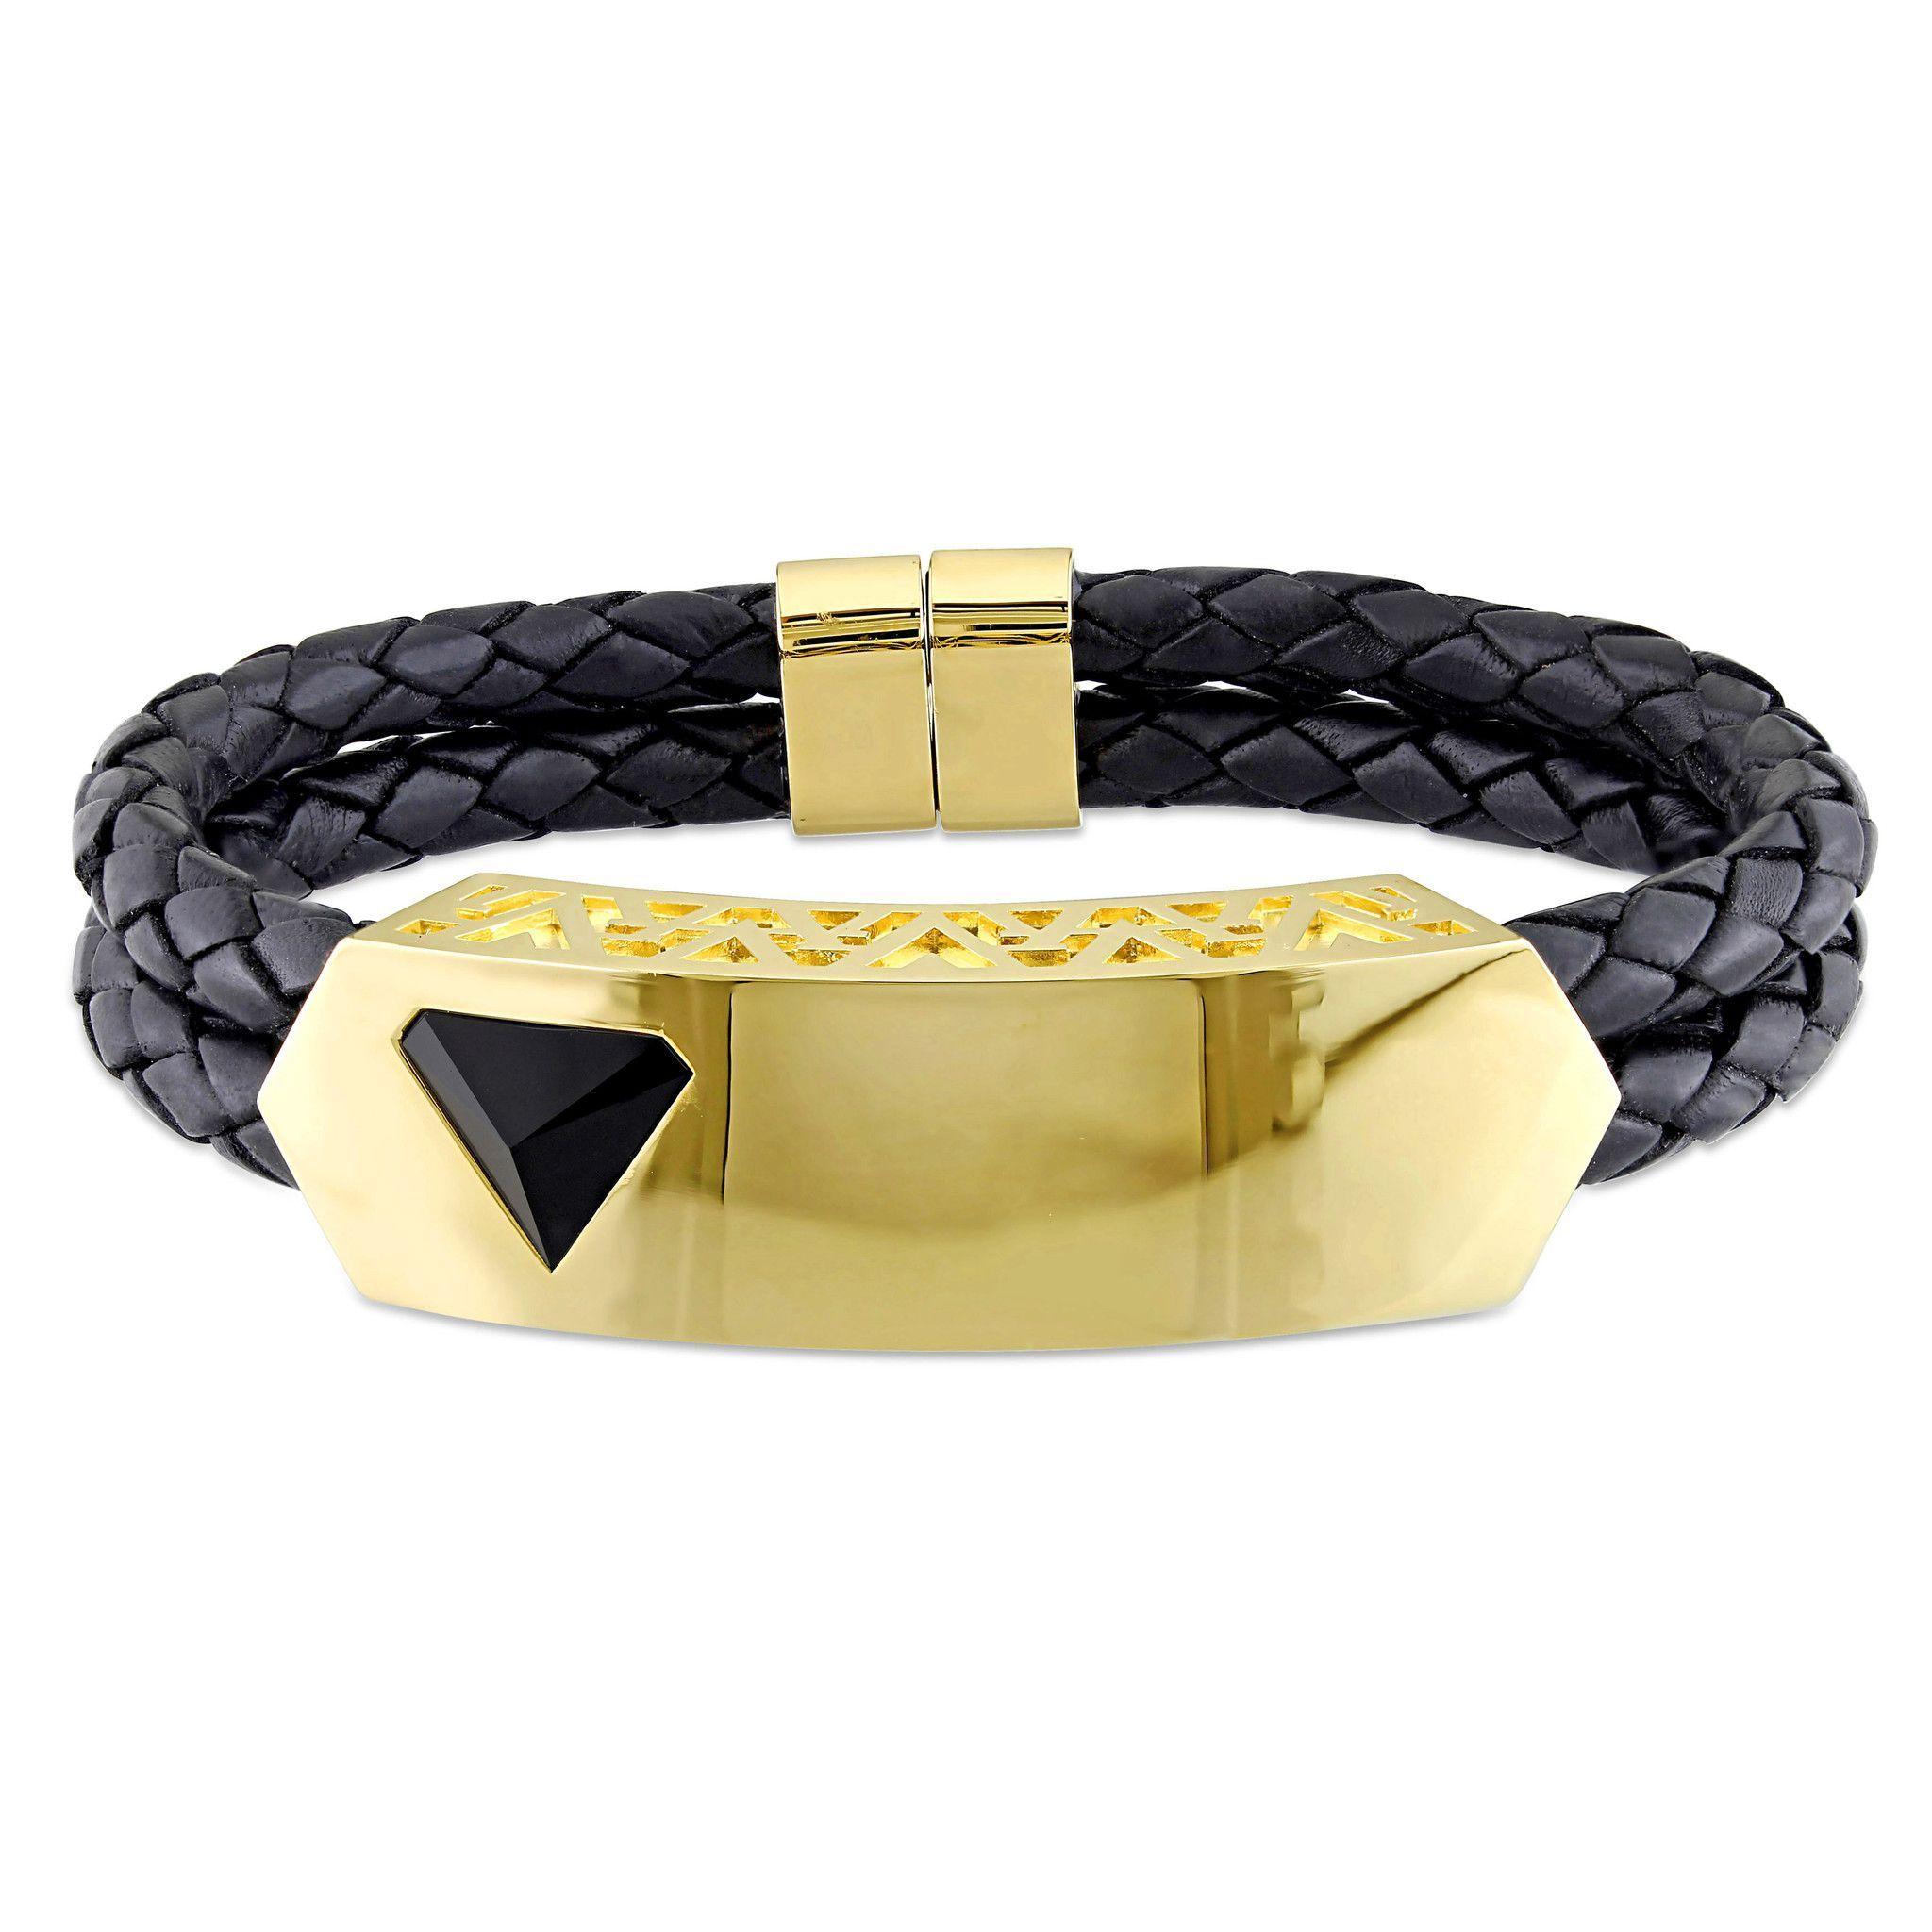 Versace abbigliamento sportivo srl menus black agate prism